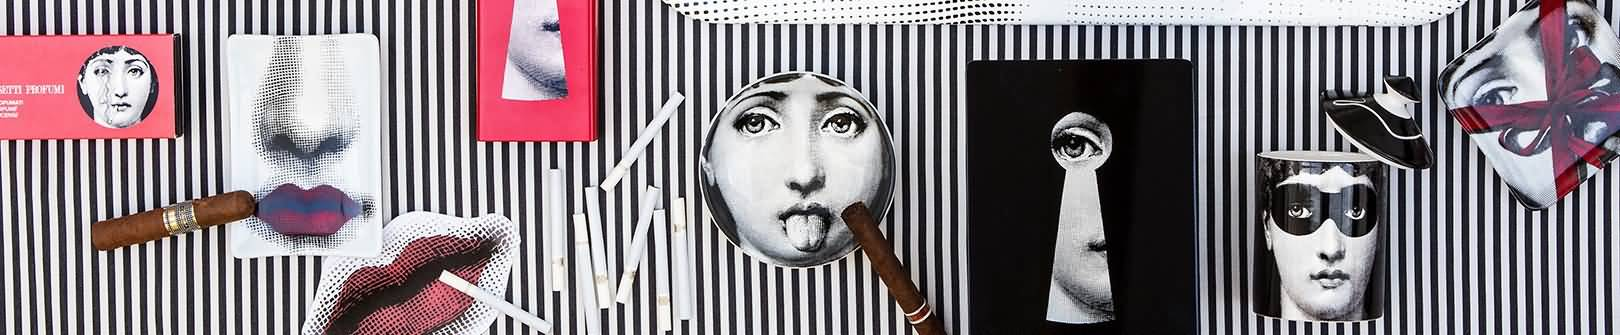 Rauchzubehör